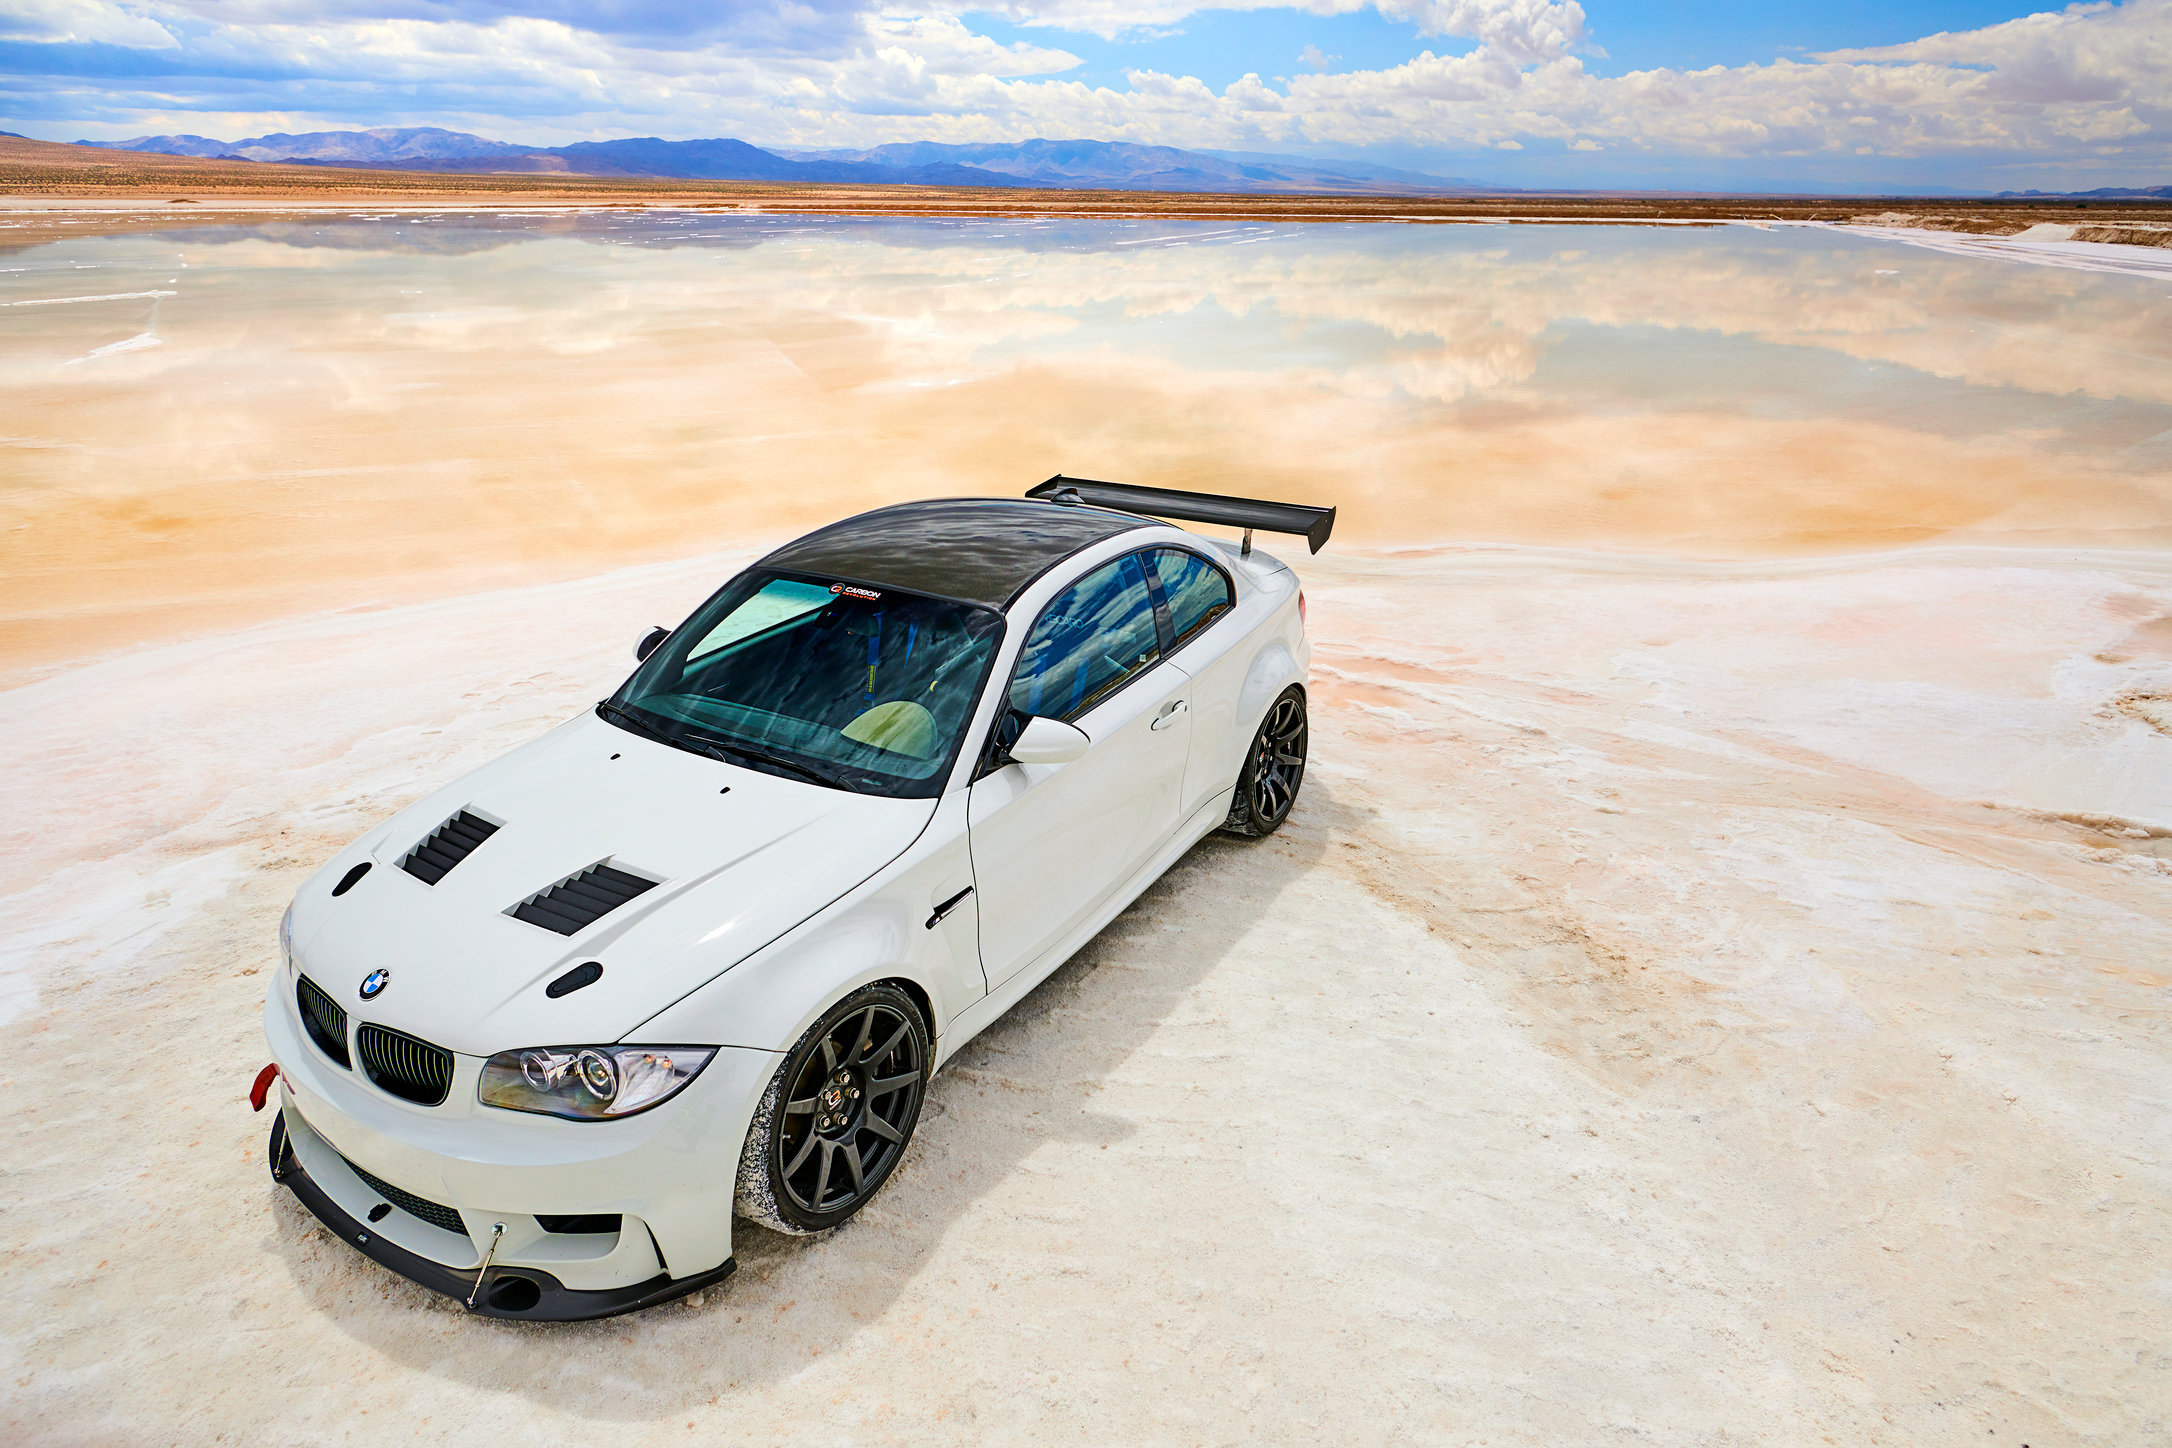 Motors_Make_Model_BMW_M_Hero_072.jpg